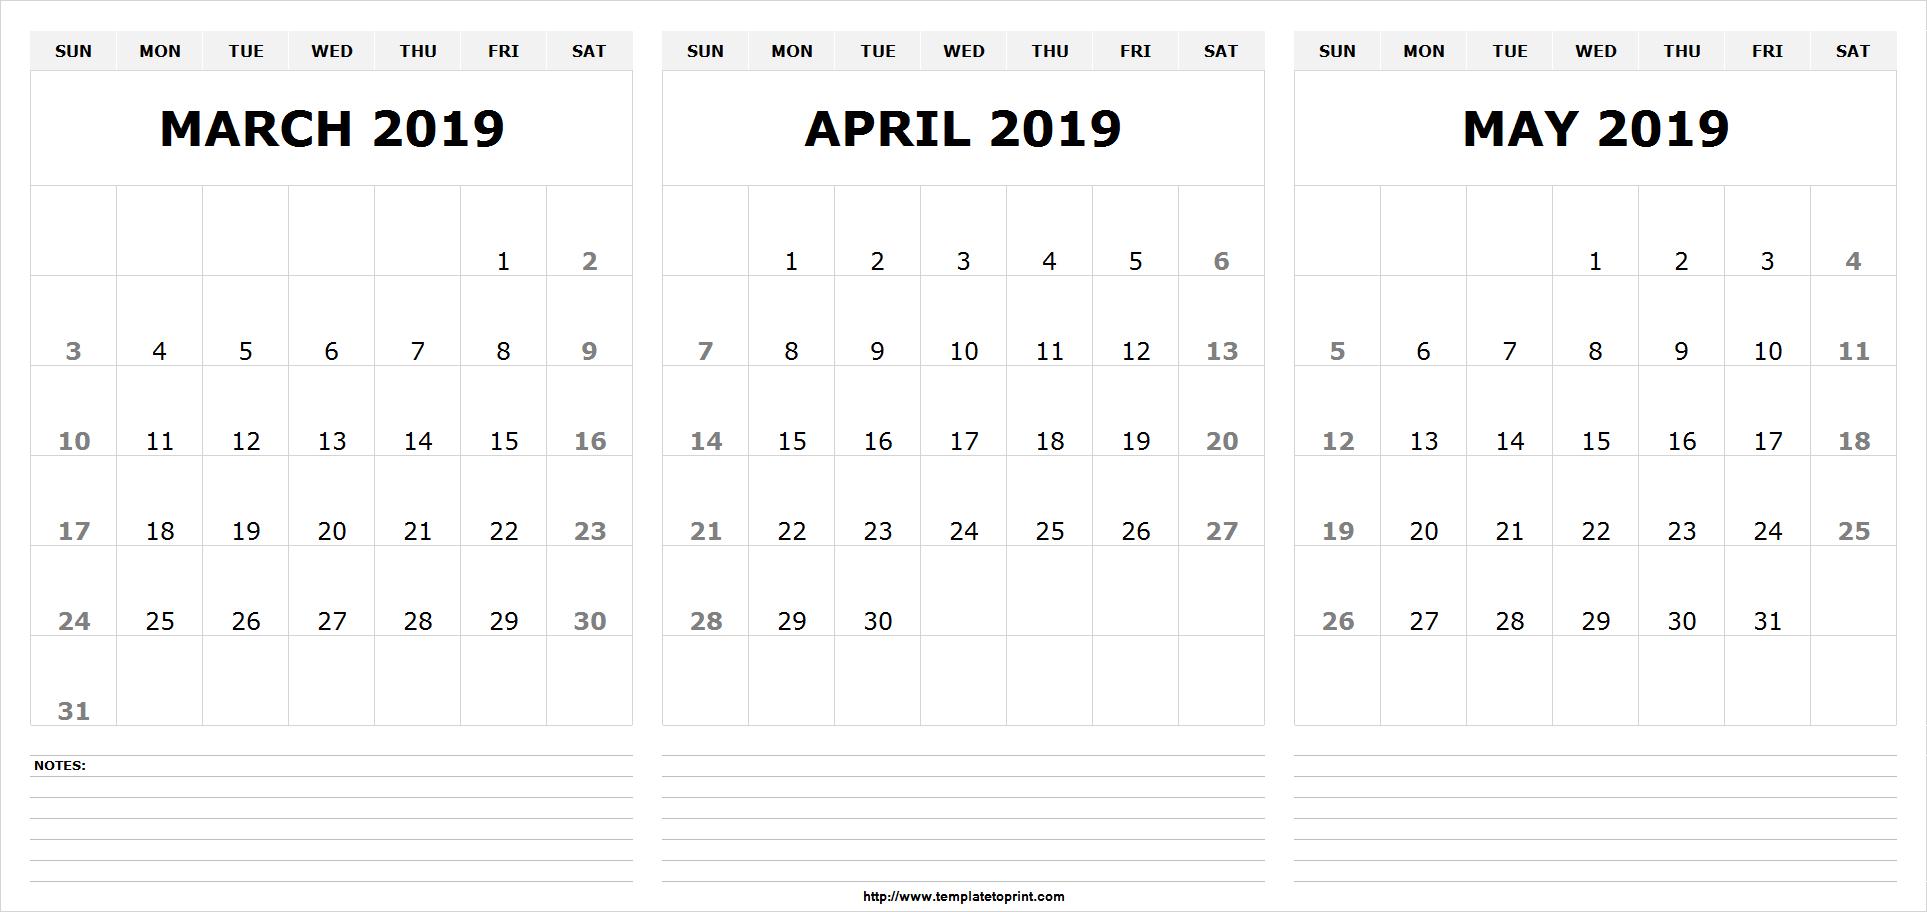 Free Printable March April May 2019 Calendar – Printable Calendar Calendar 2019 April May